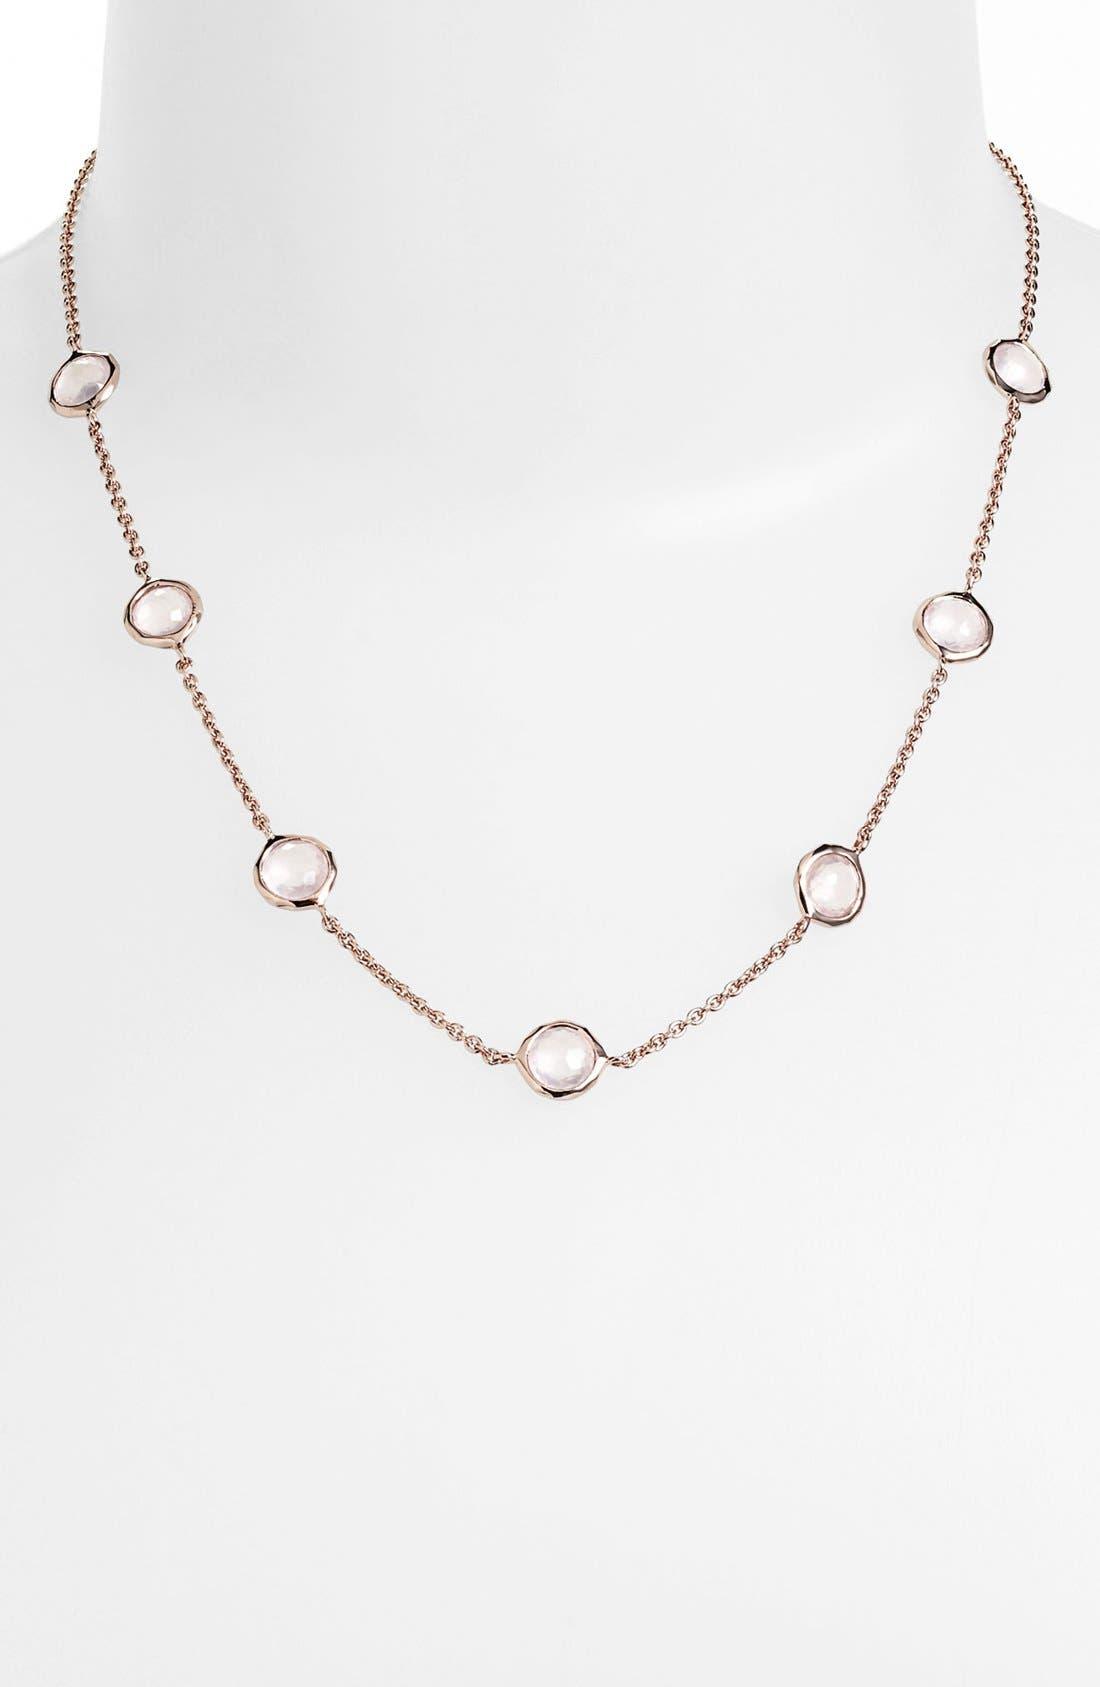 Alternate Image 1 Selected - Ippolita 'Rock Candy' 7-Station Lollipop Necklace